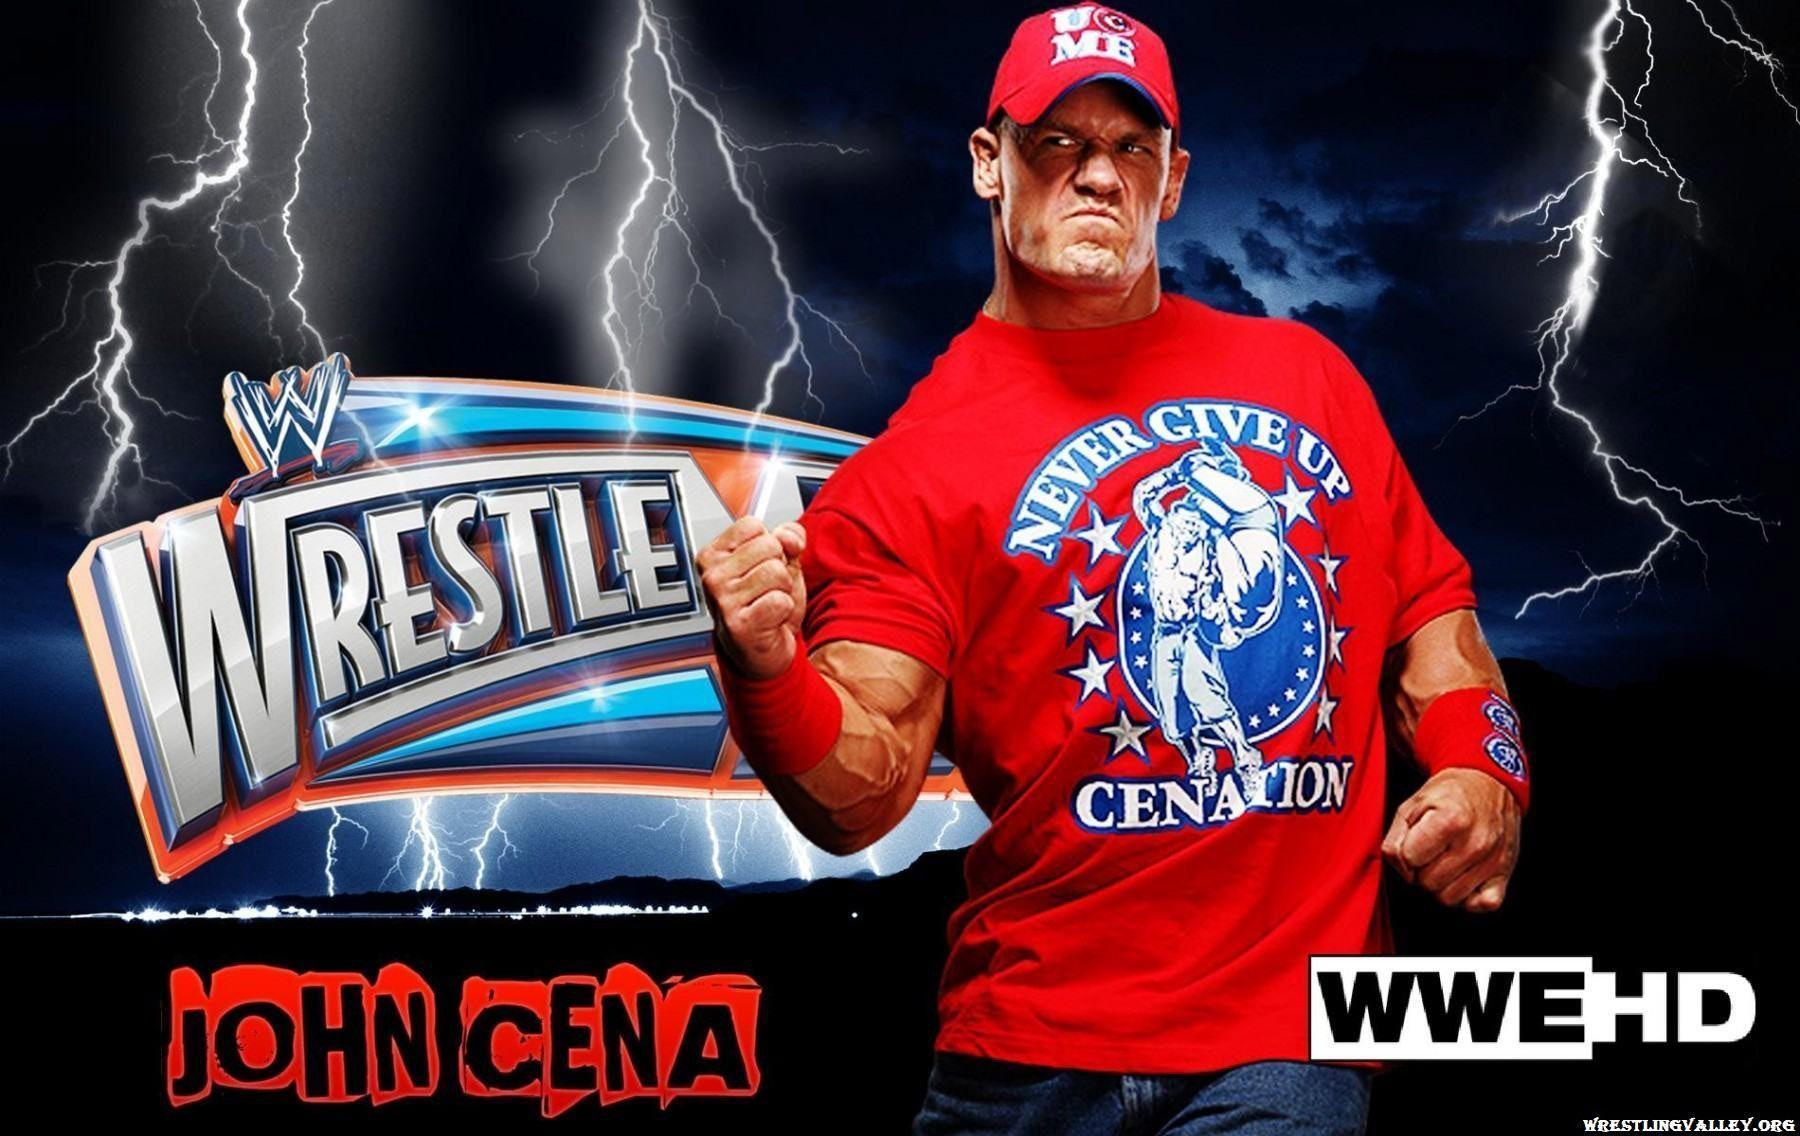 John Cena Wallpapers 2017 HD - Wallpaper Cave